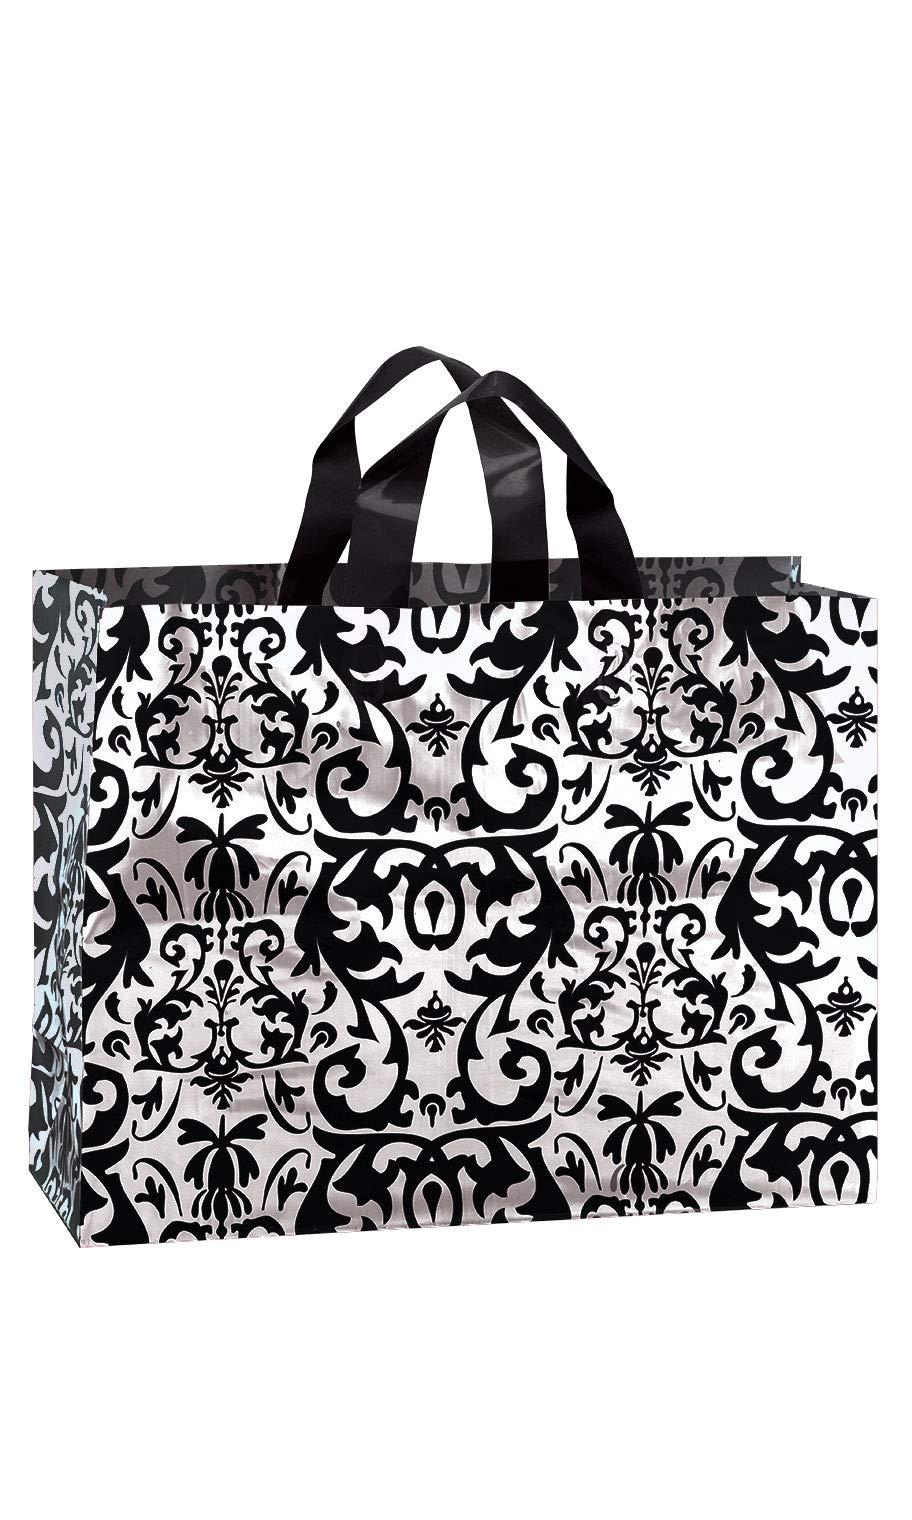 SSWBasics Large Black Damask Frosted Plastic Shopping Bags - 16'' x 6'' x 12'' - Case of 100